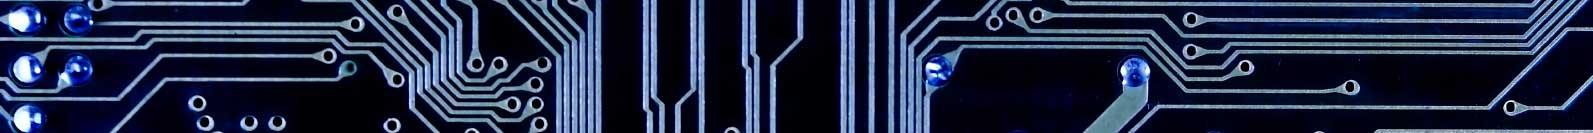 circuit board image banner